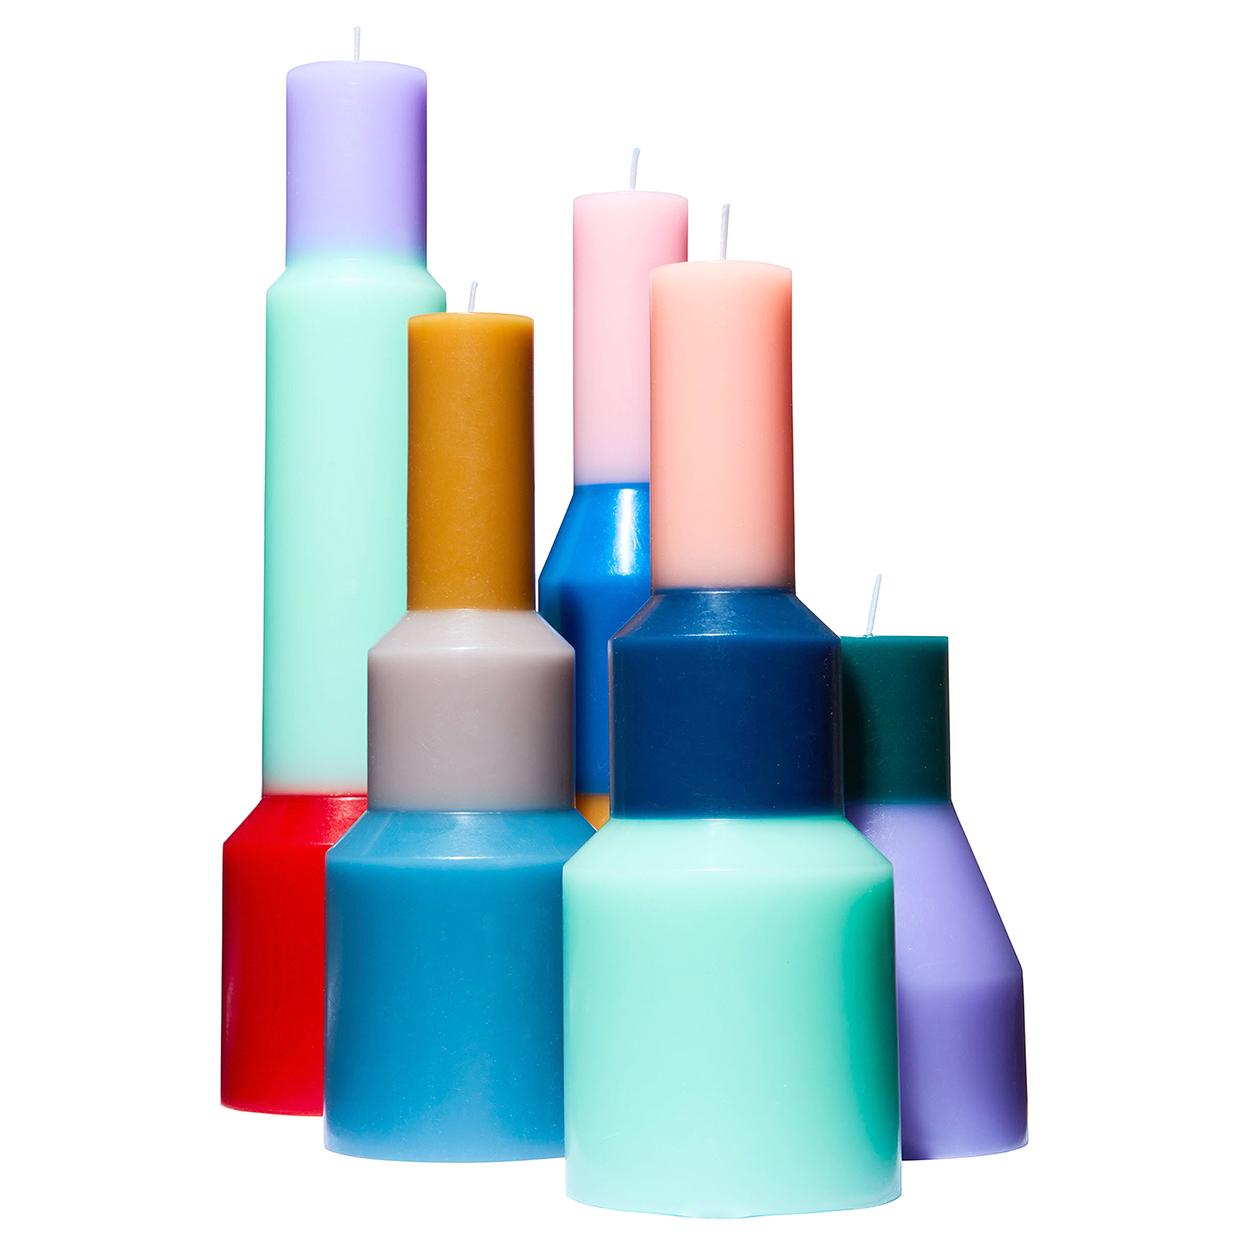 colorful sculptural Hay Pillar Candles